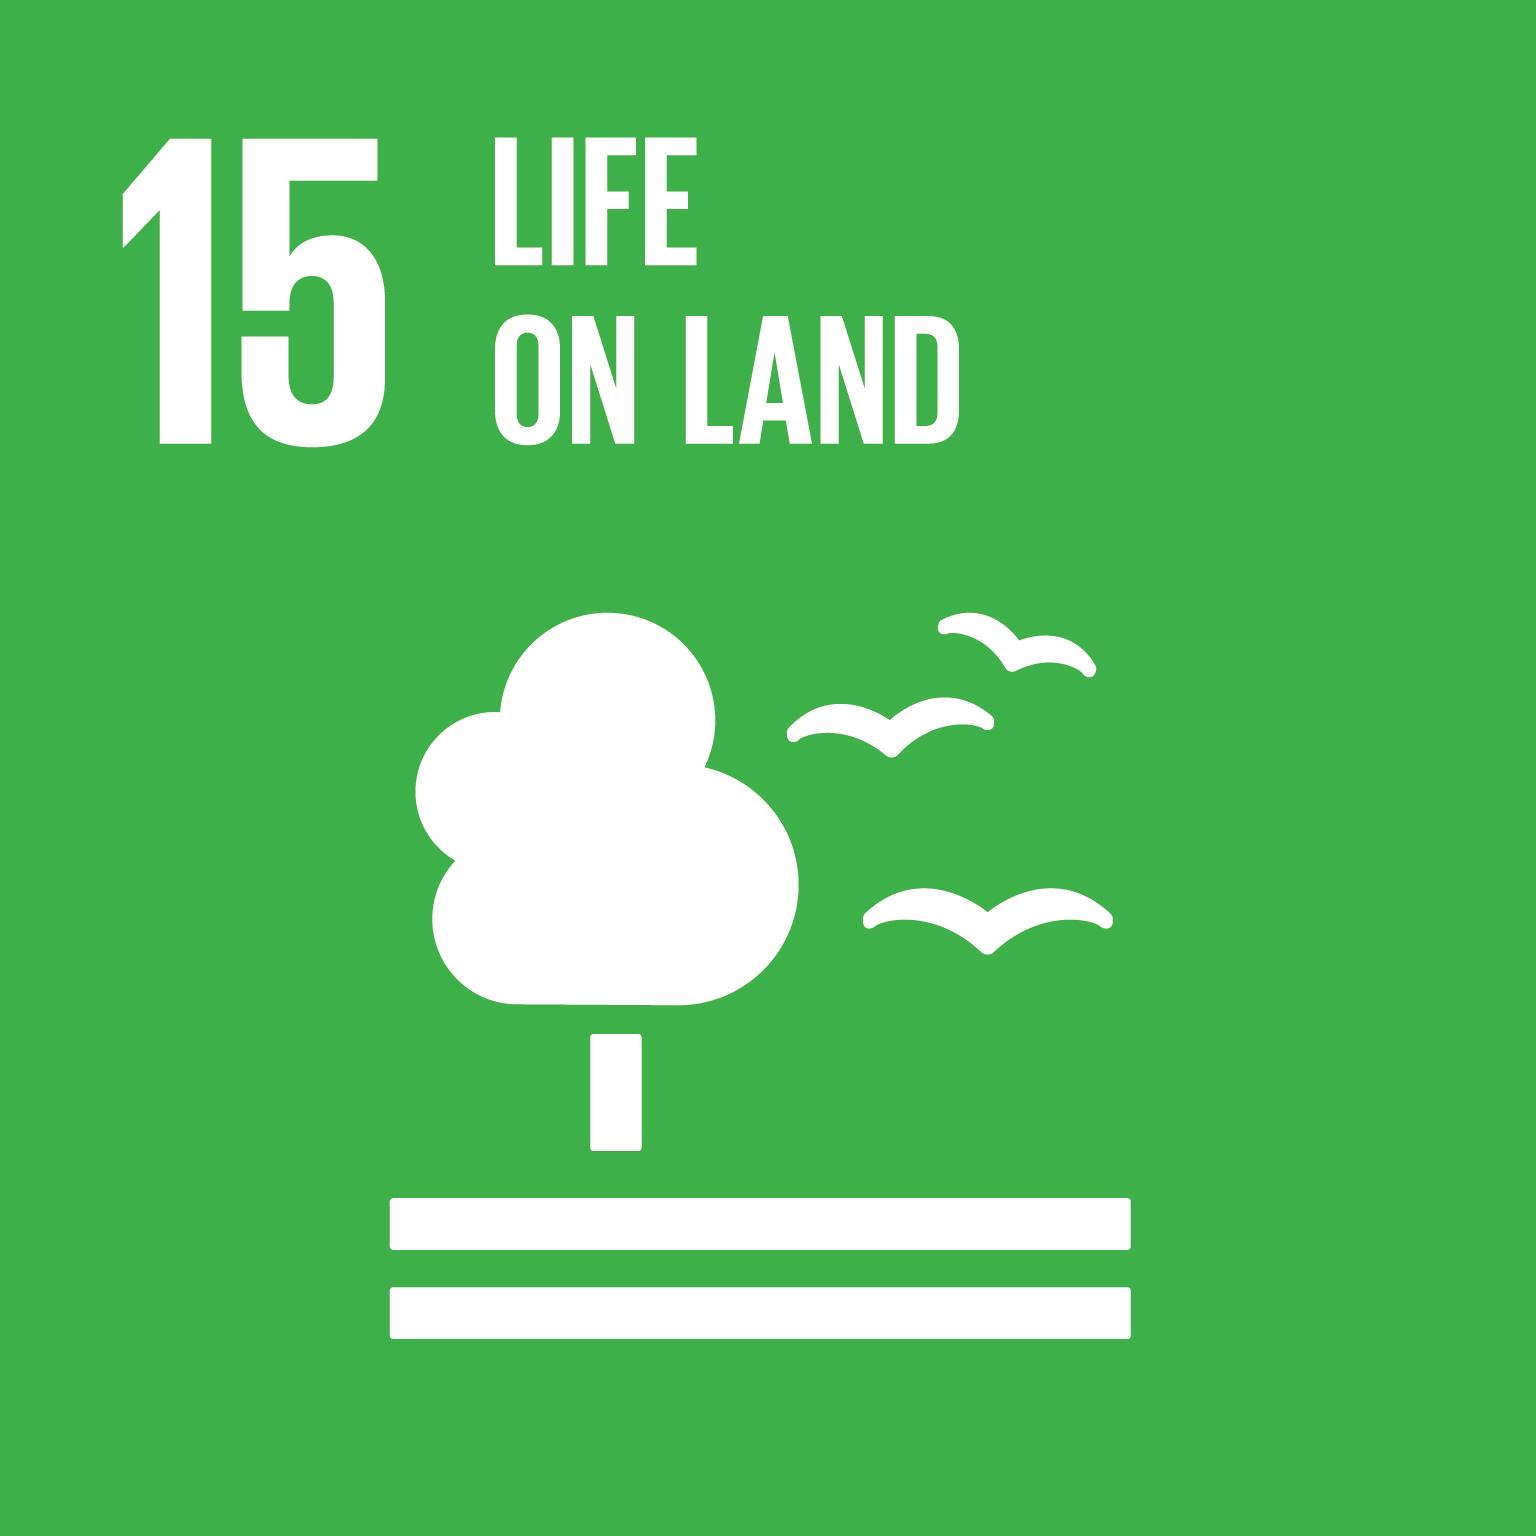 15 Life on Land SDG